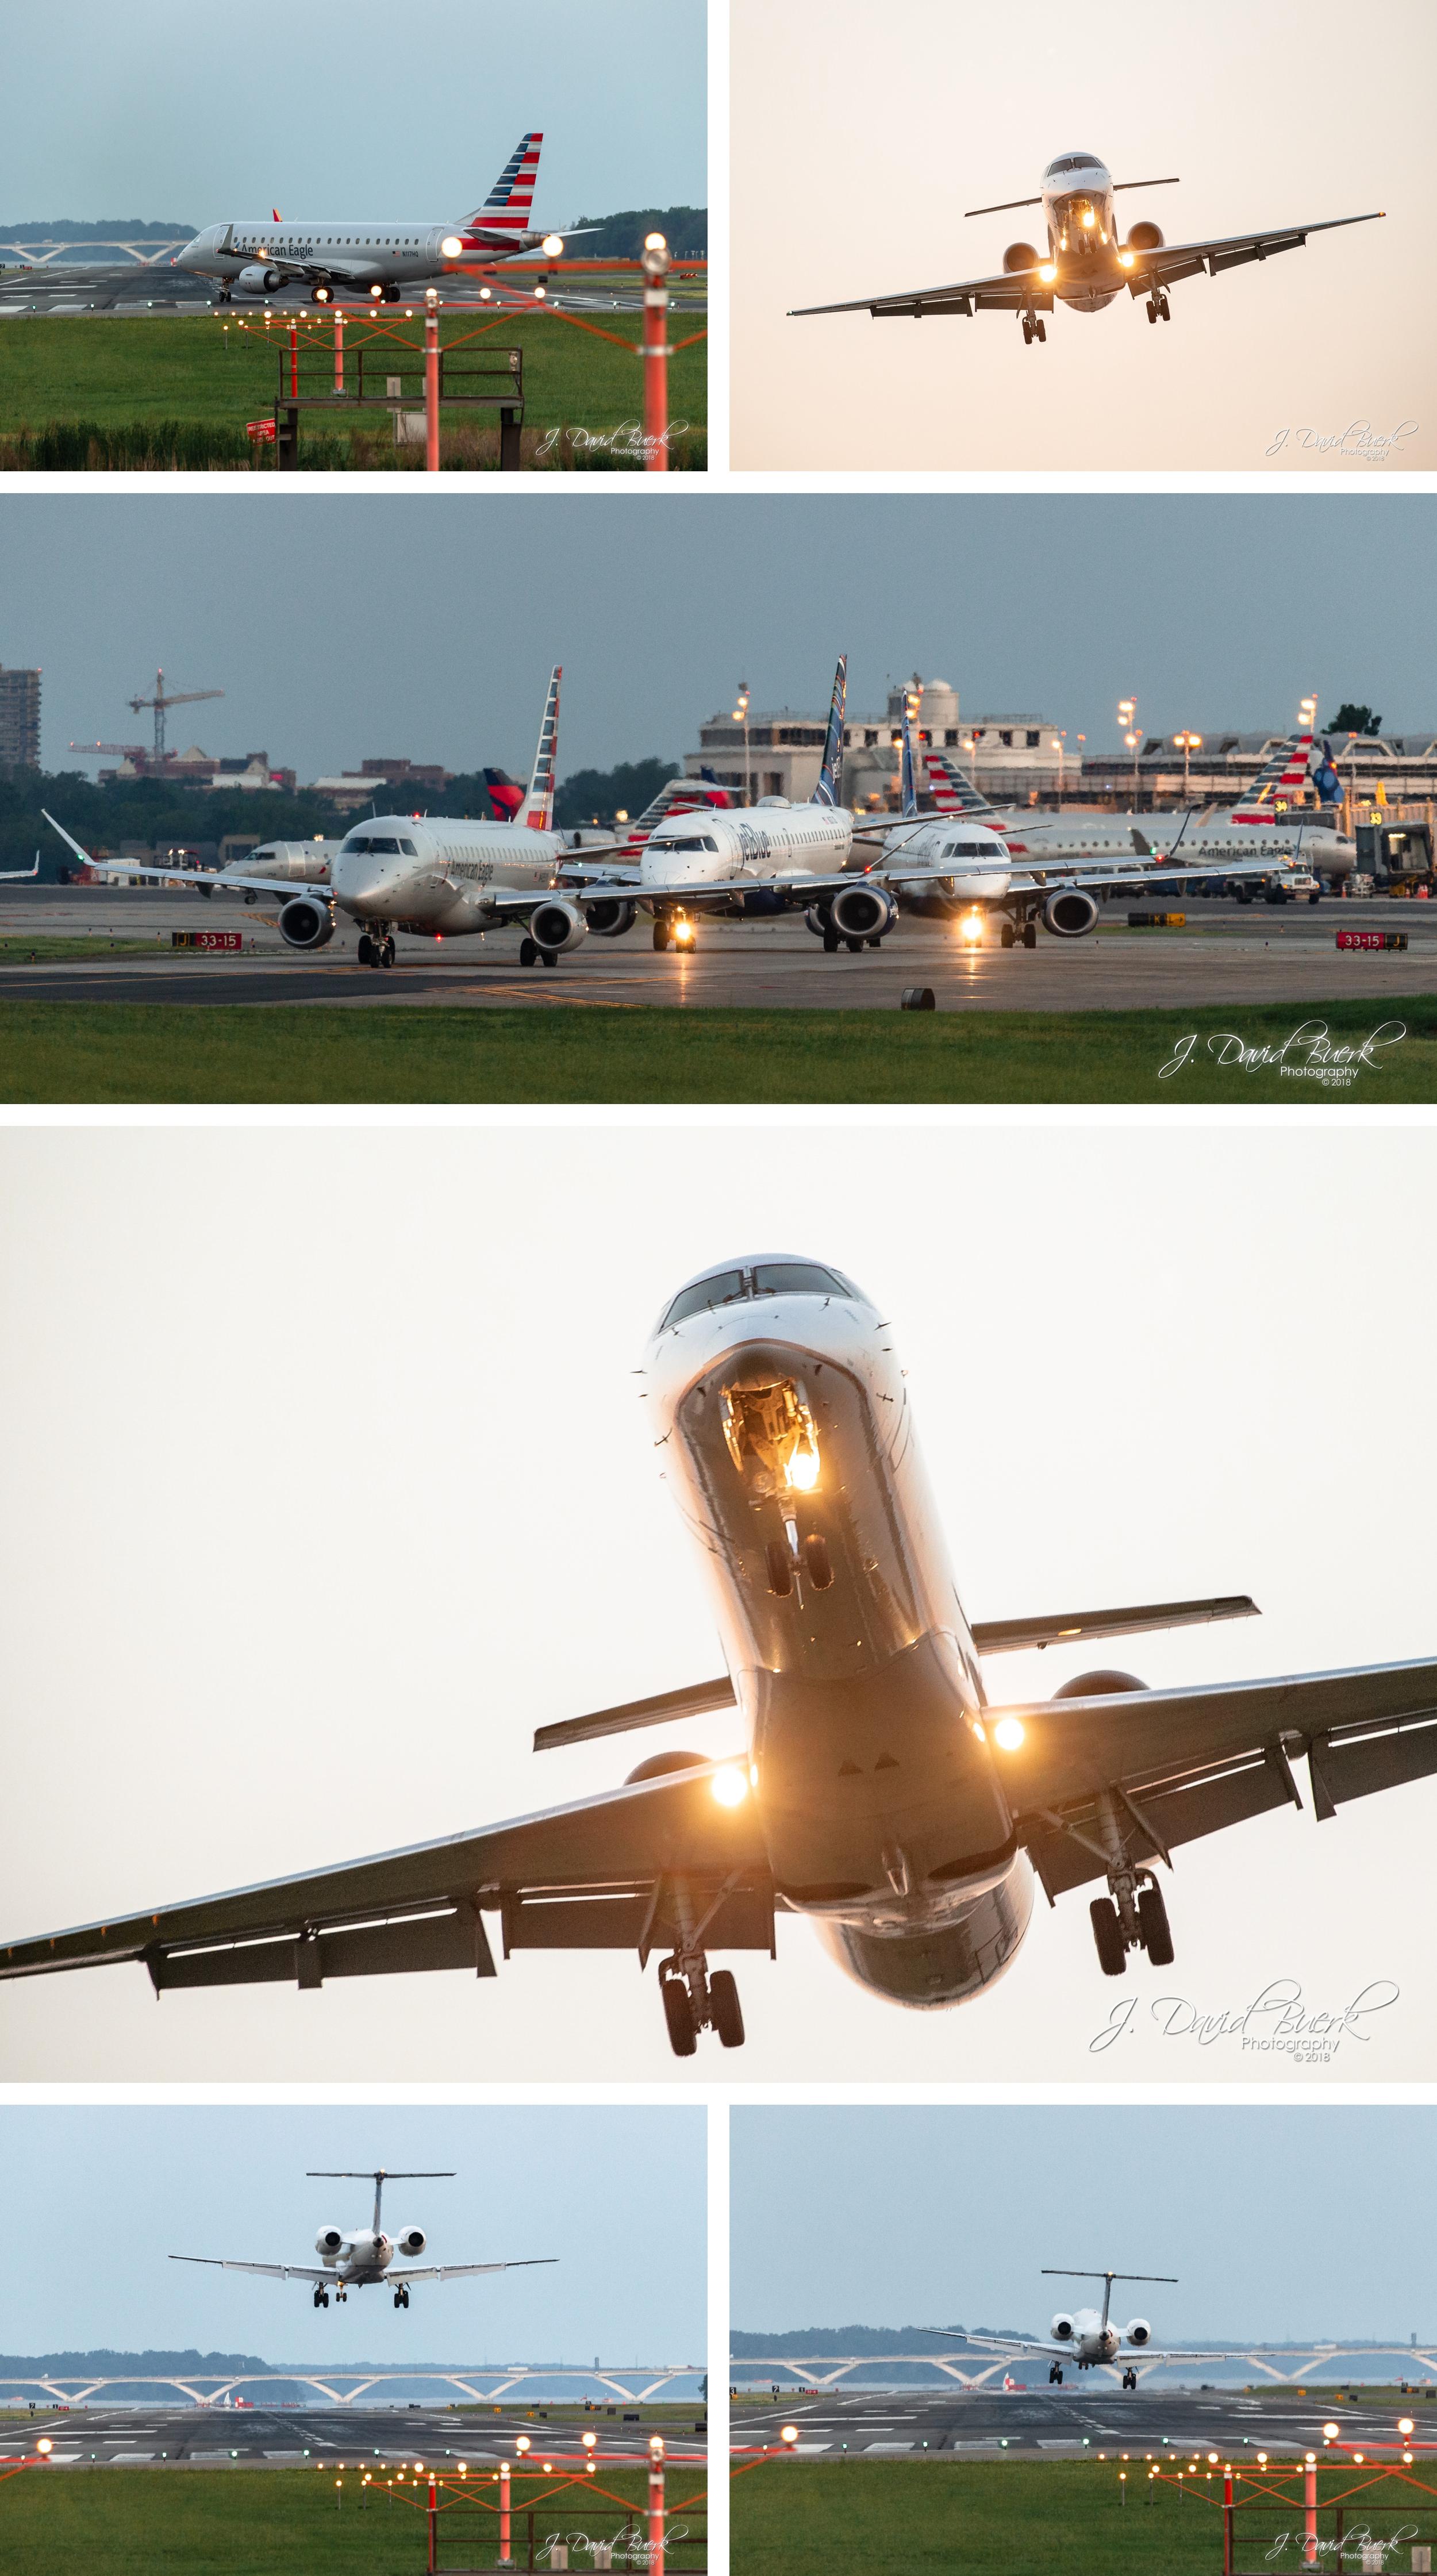 20180525 DCA Planespotting 2.jpg